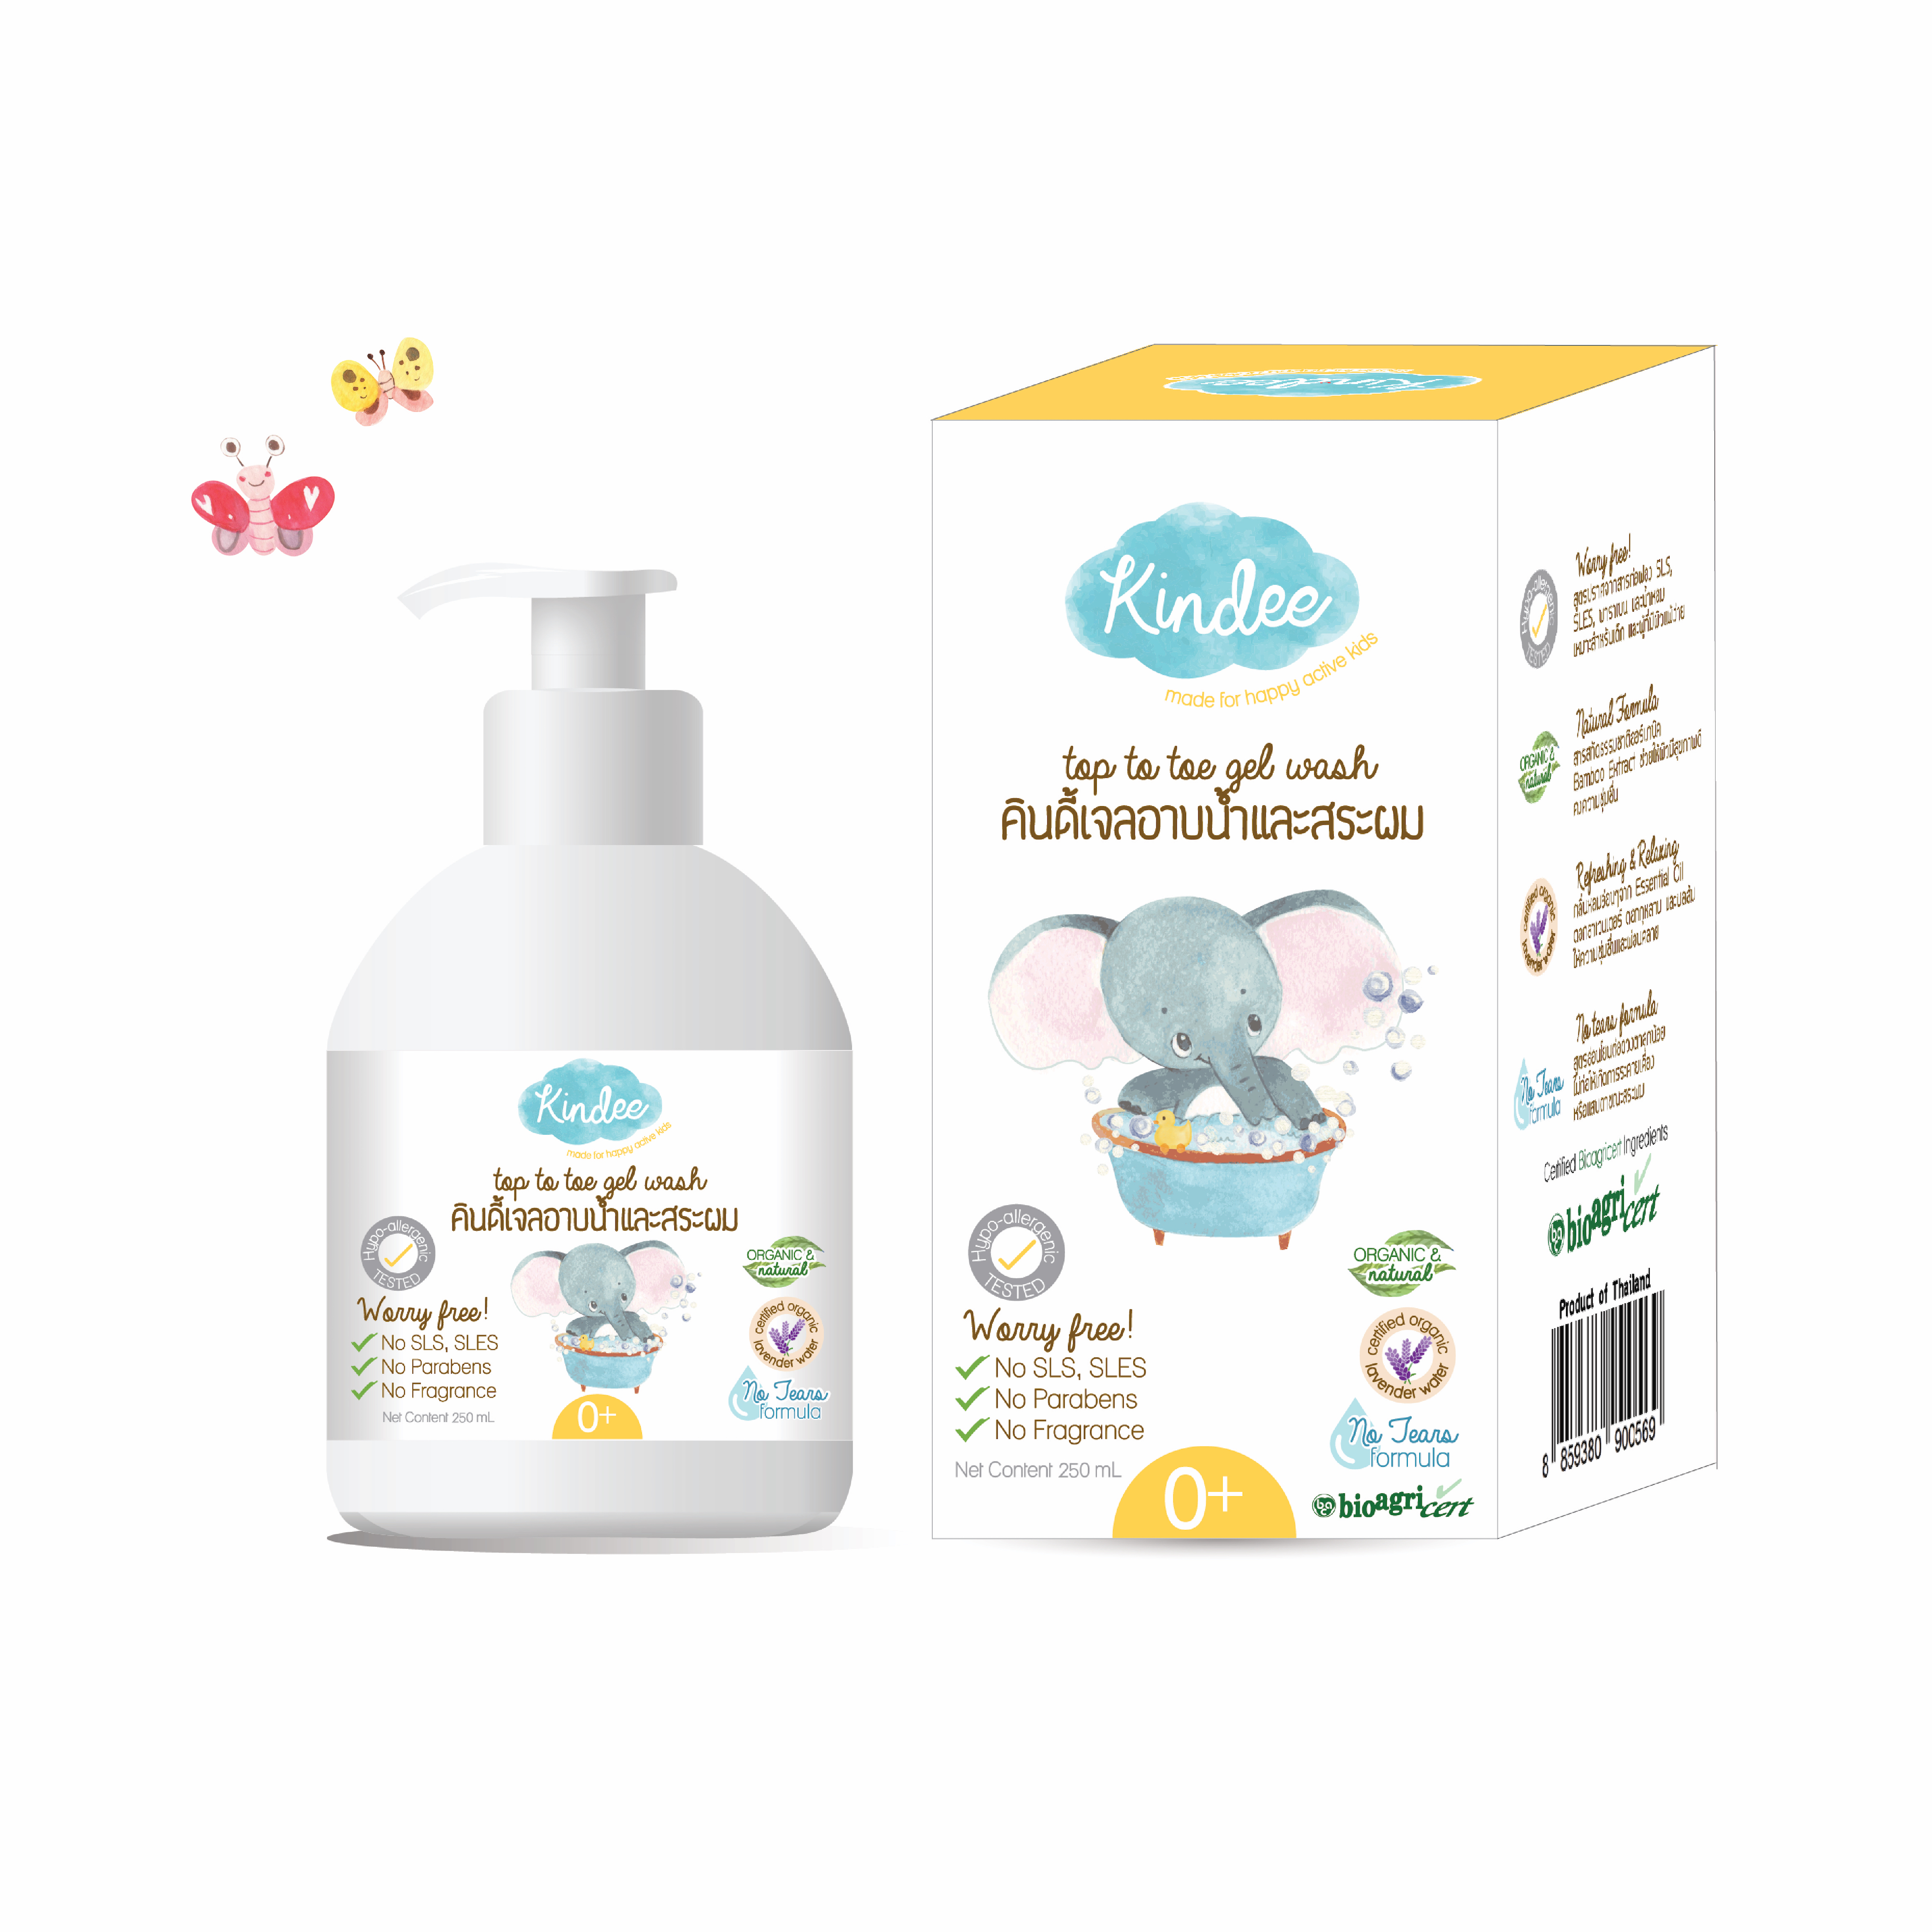 Kindeekids - Organic Top To Toe Gel Wash 0+